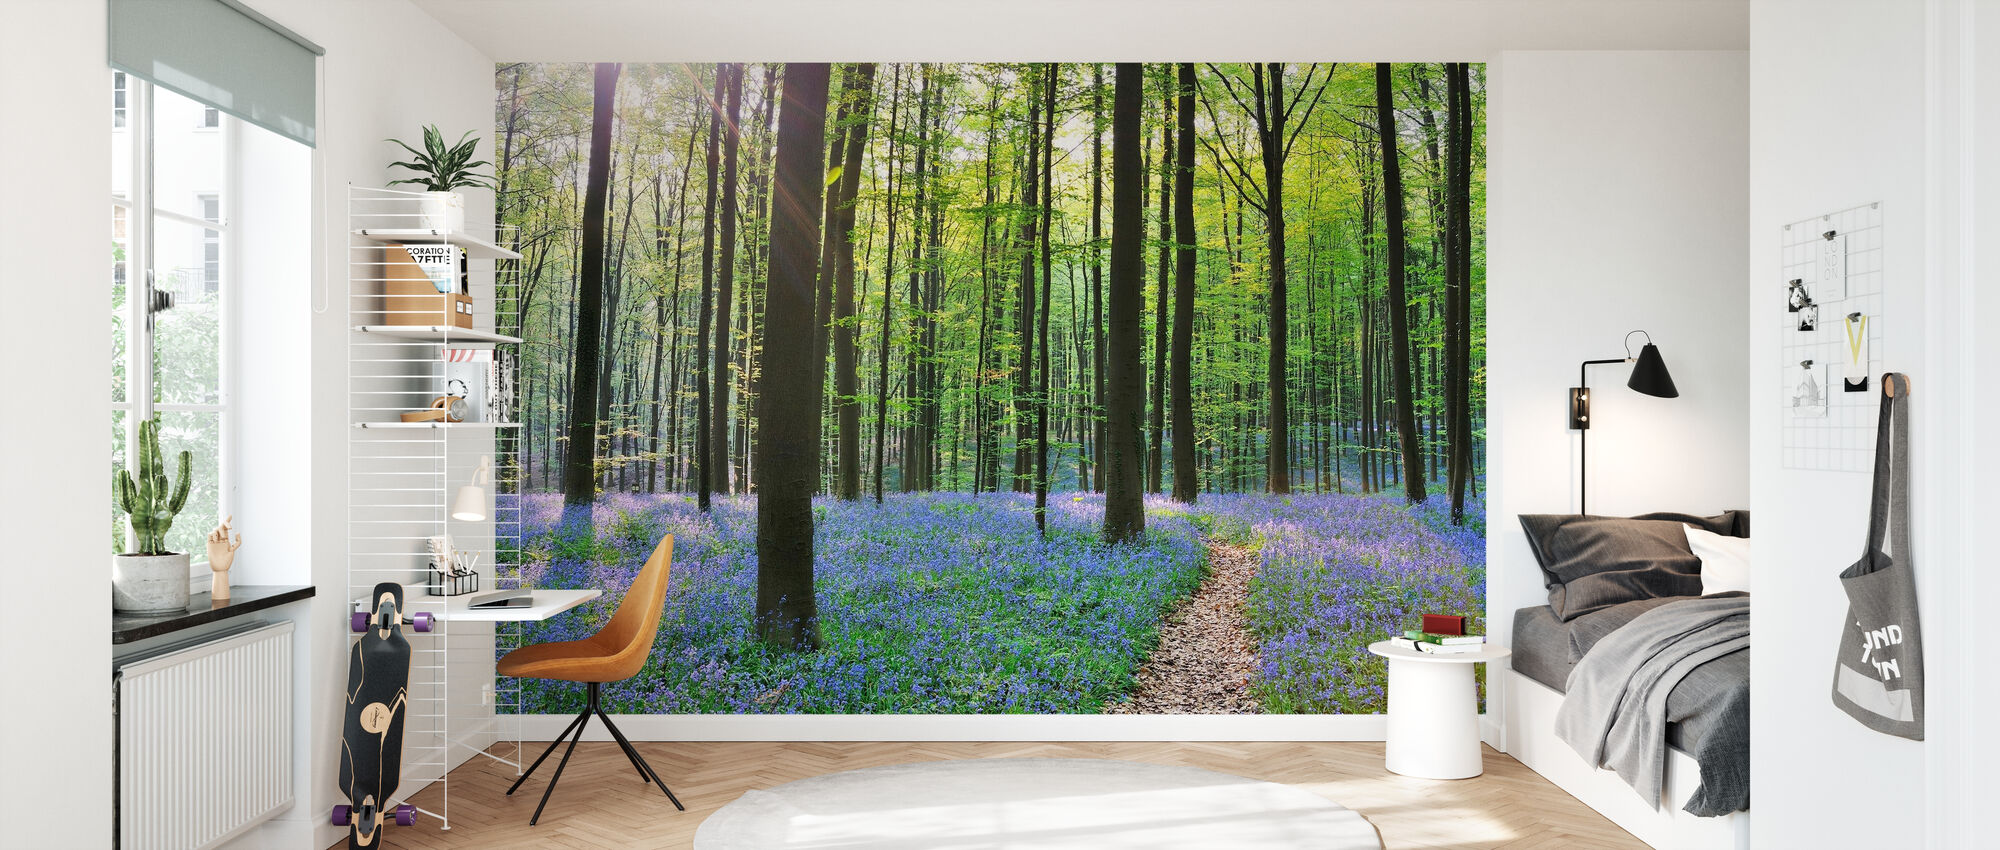 Path through Bluebells Forest - Wallpaper - Kids Room